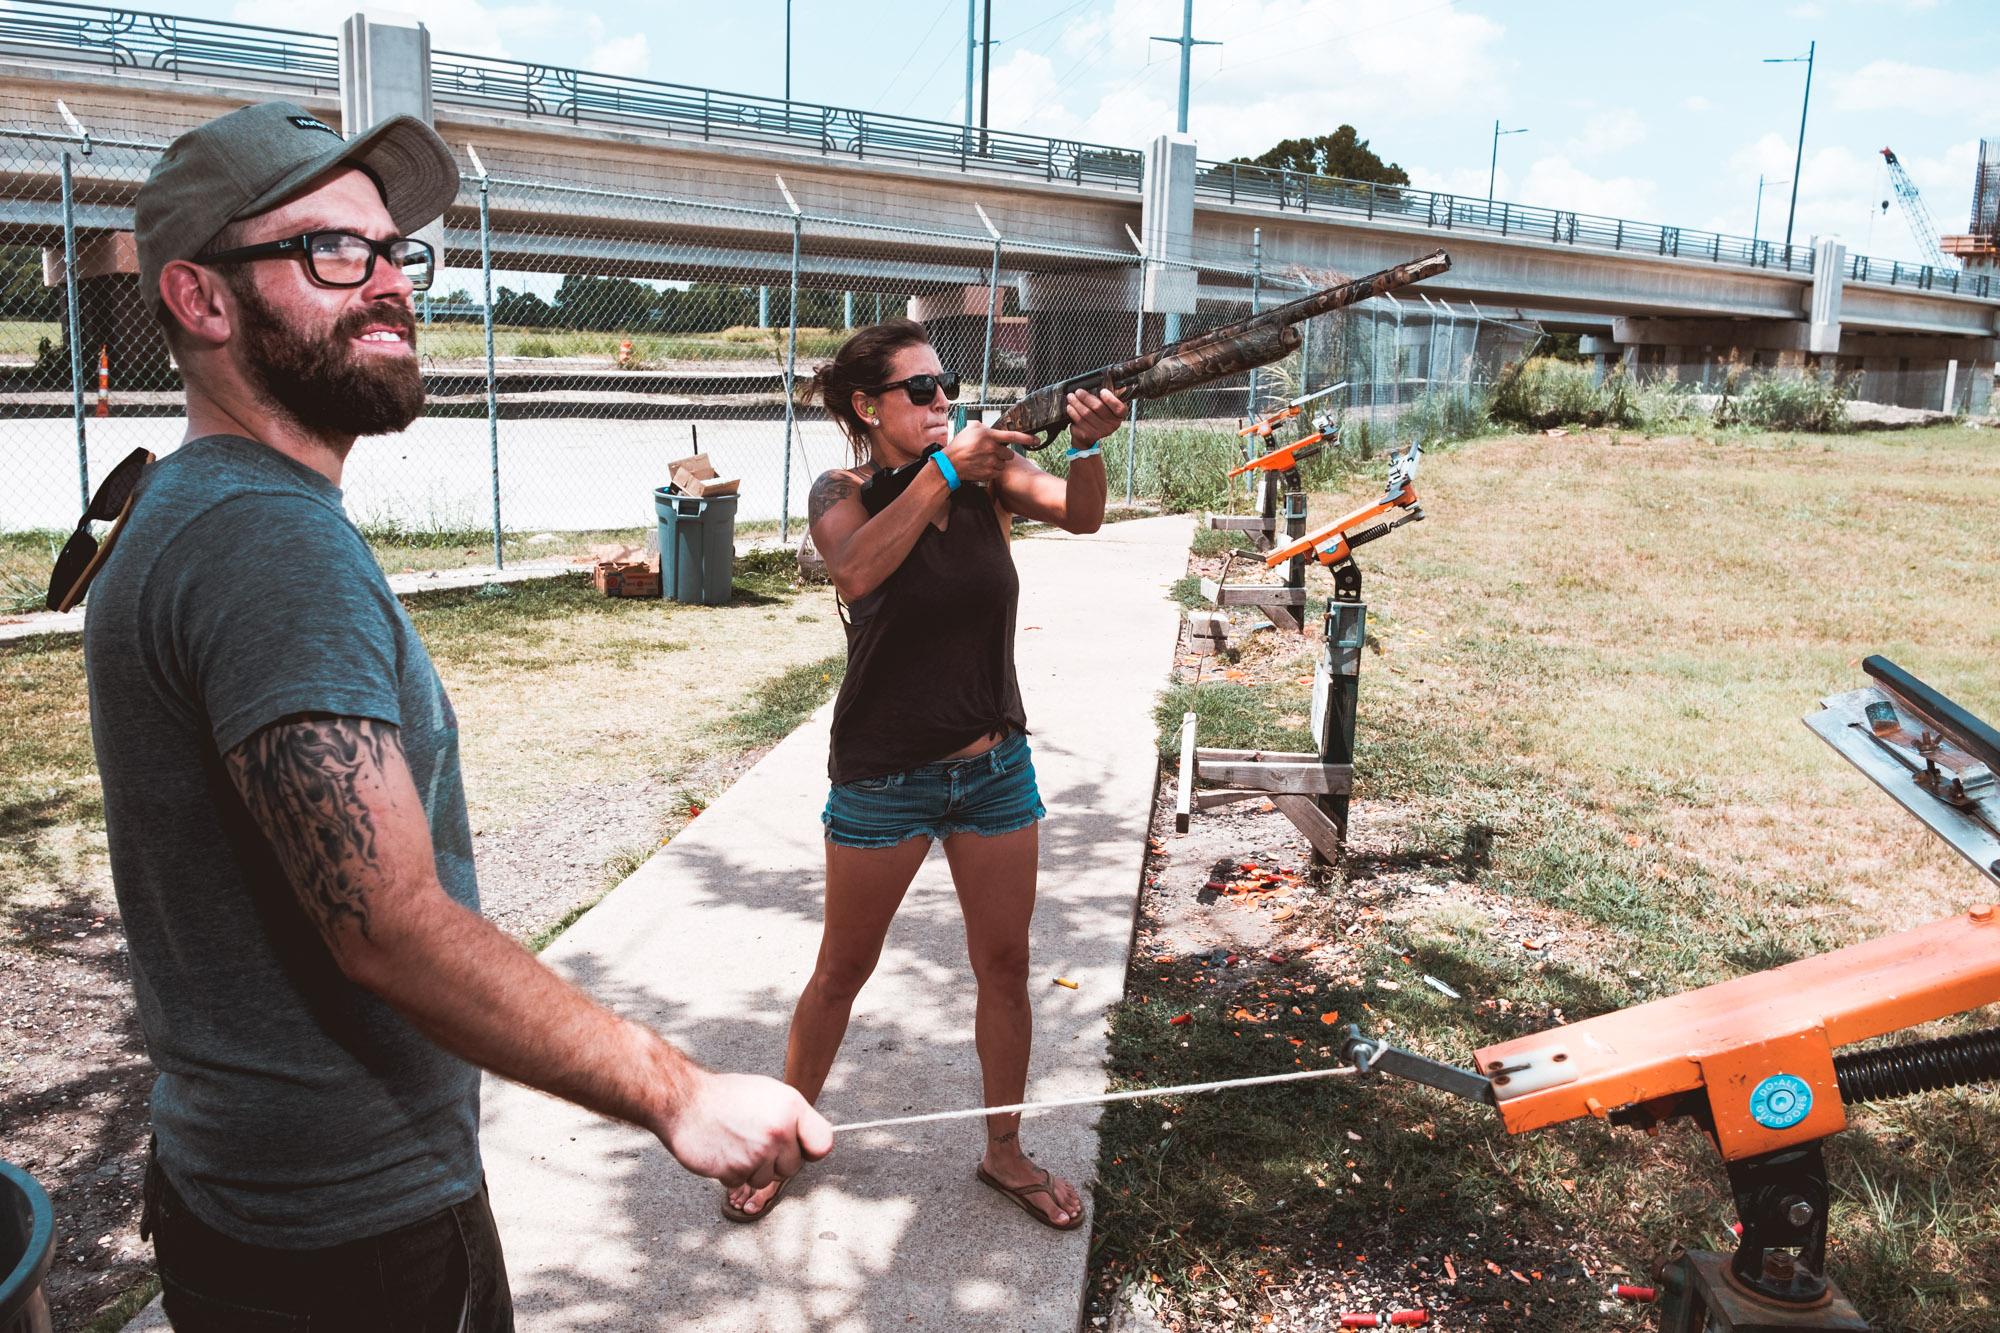 Bob and Michelle 12 Gauge Shotgun Garland Shooting Range